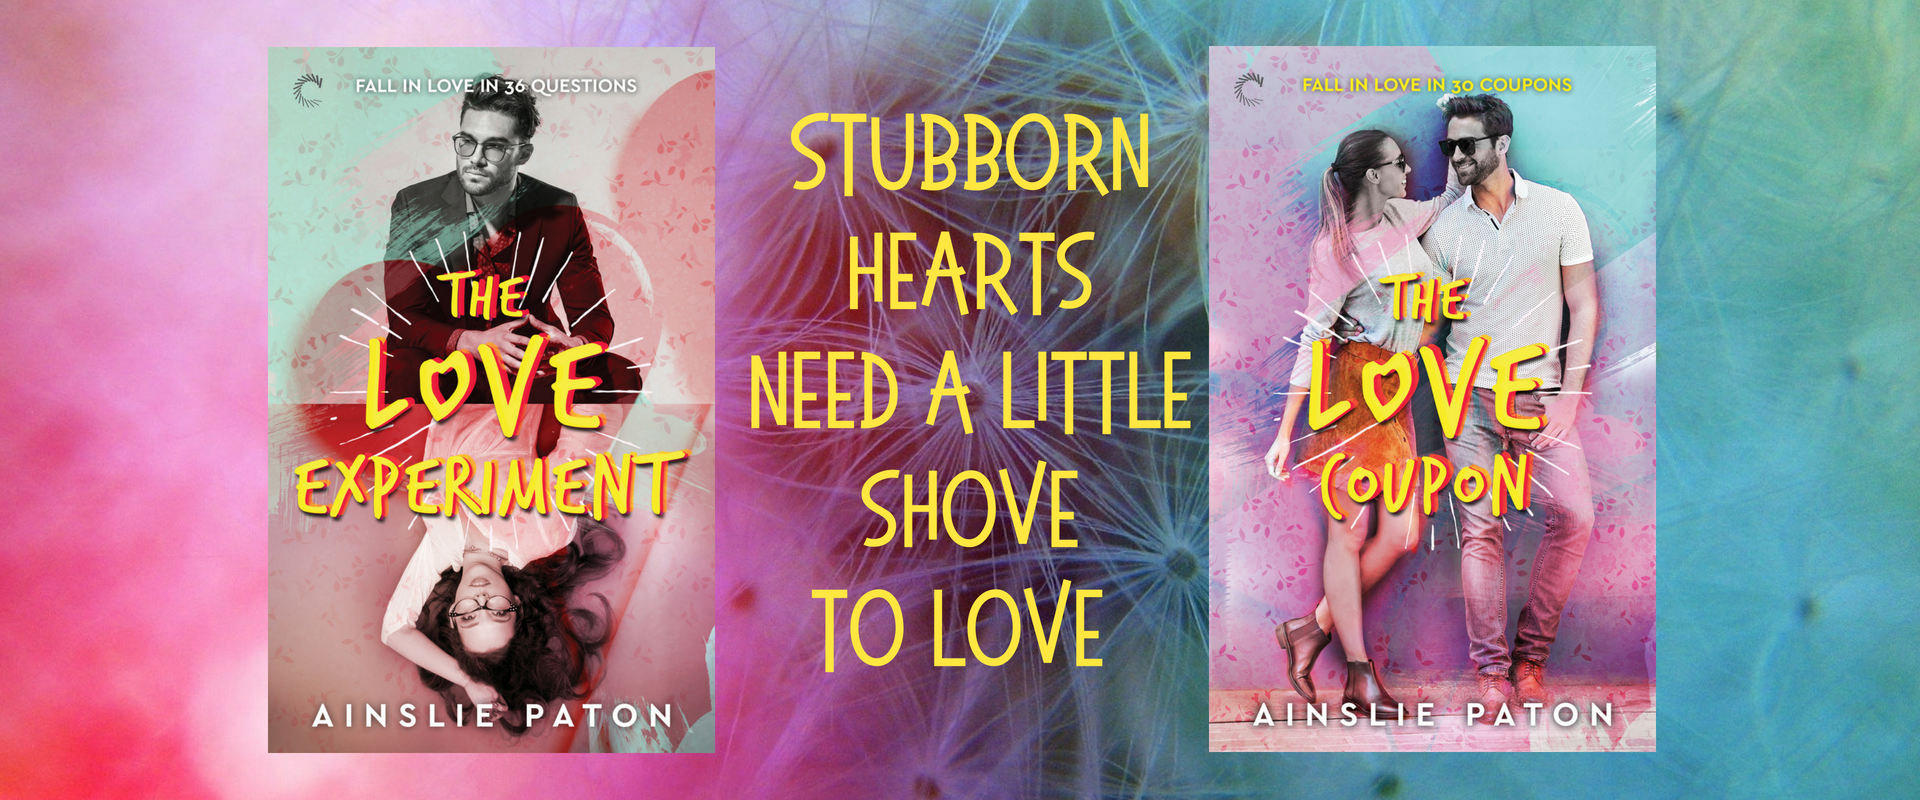 Web Stubborn hearts both covers